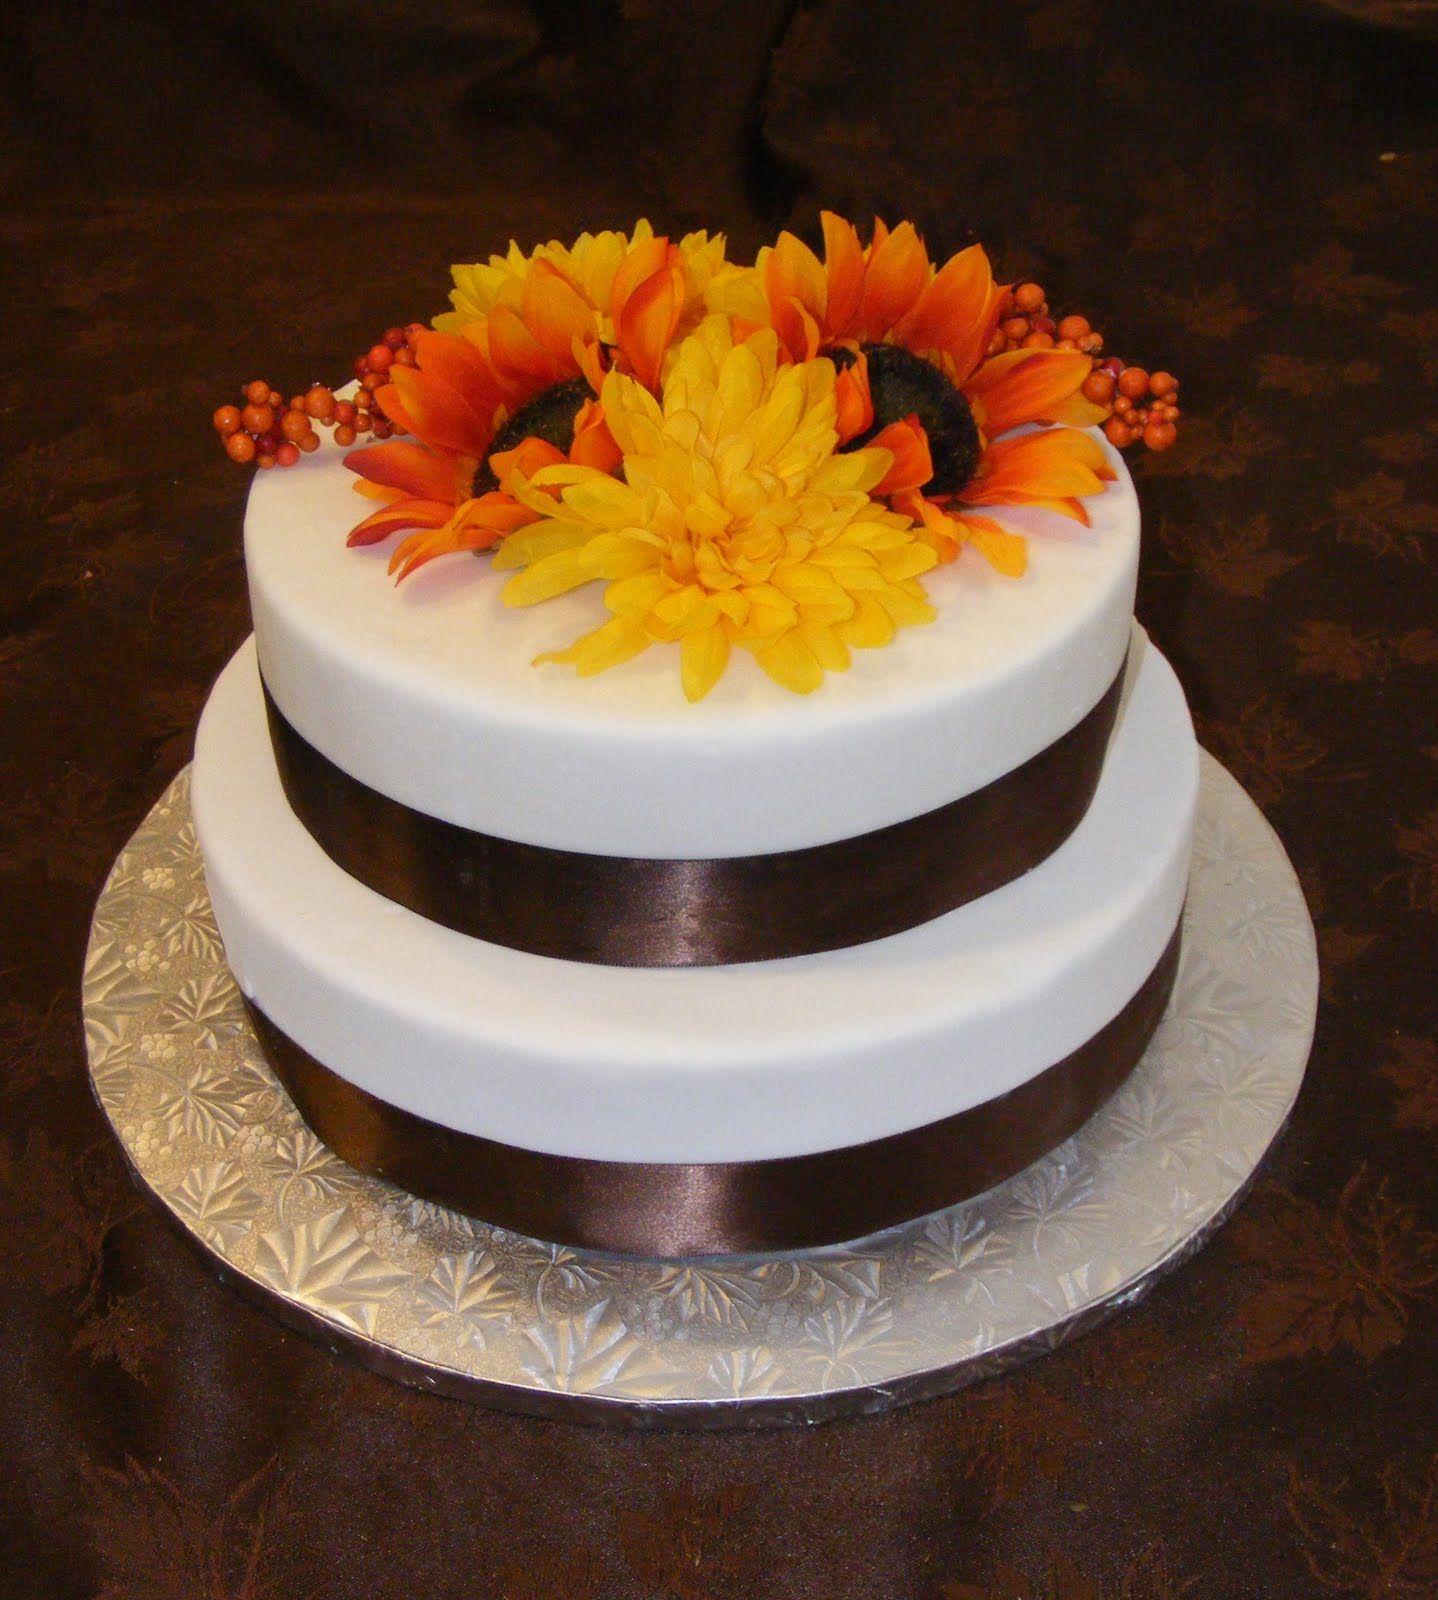 2 layer 2 tier wedding cakes, Wedding cake prices, Cheap